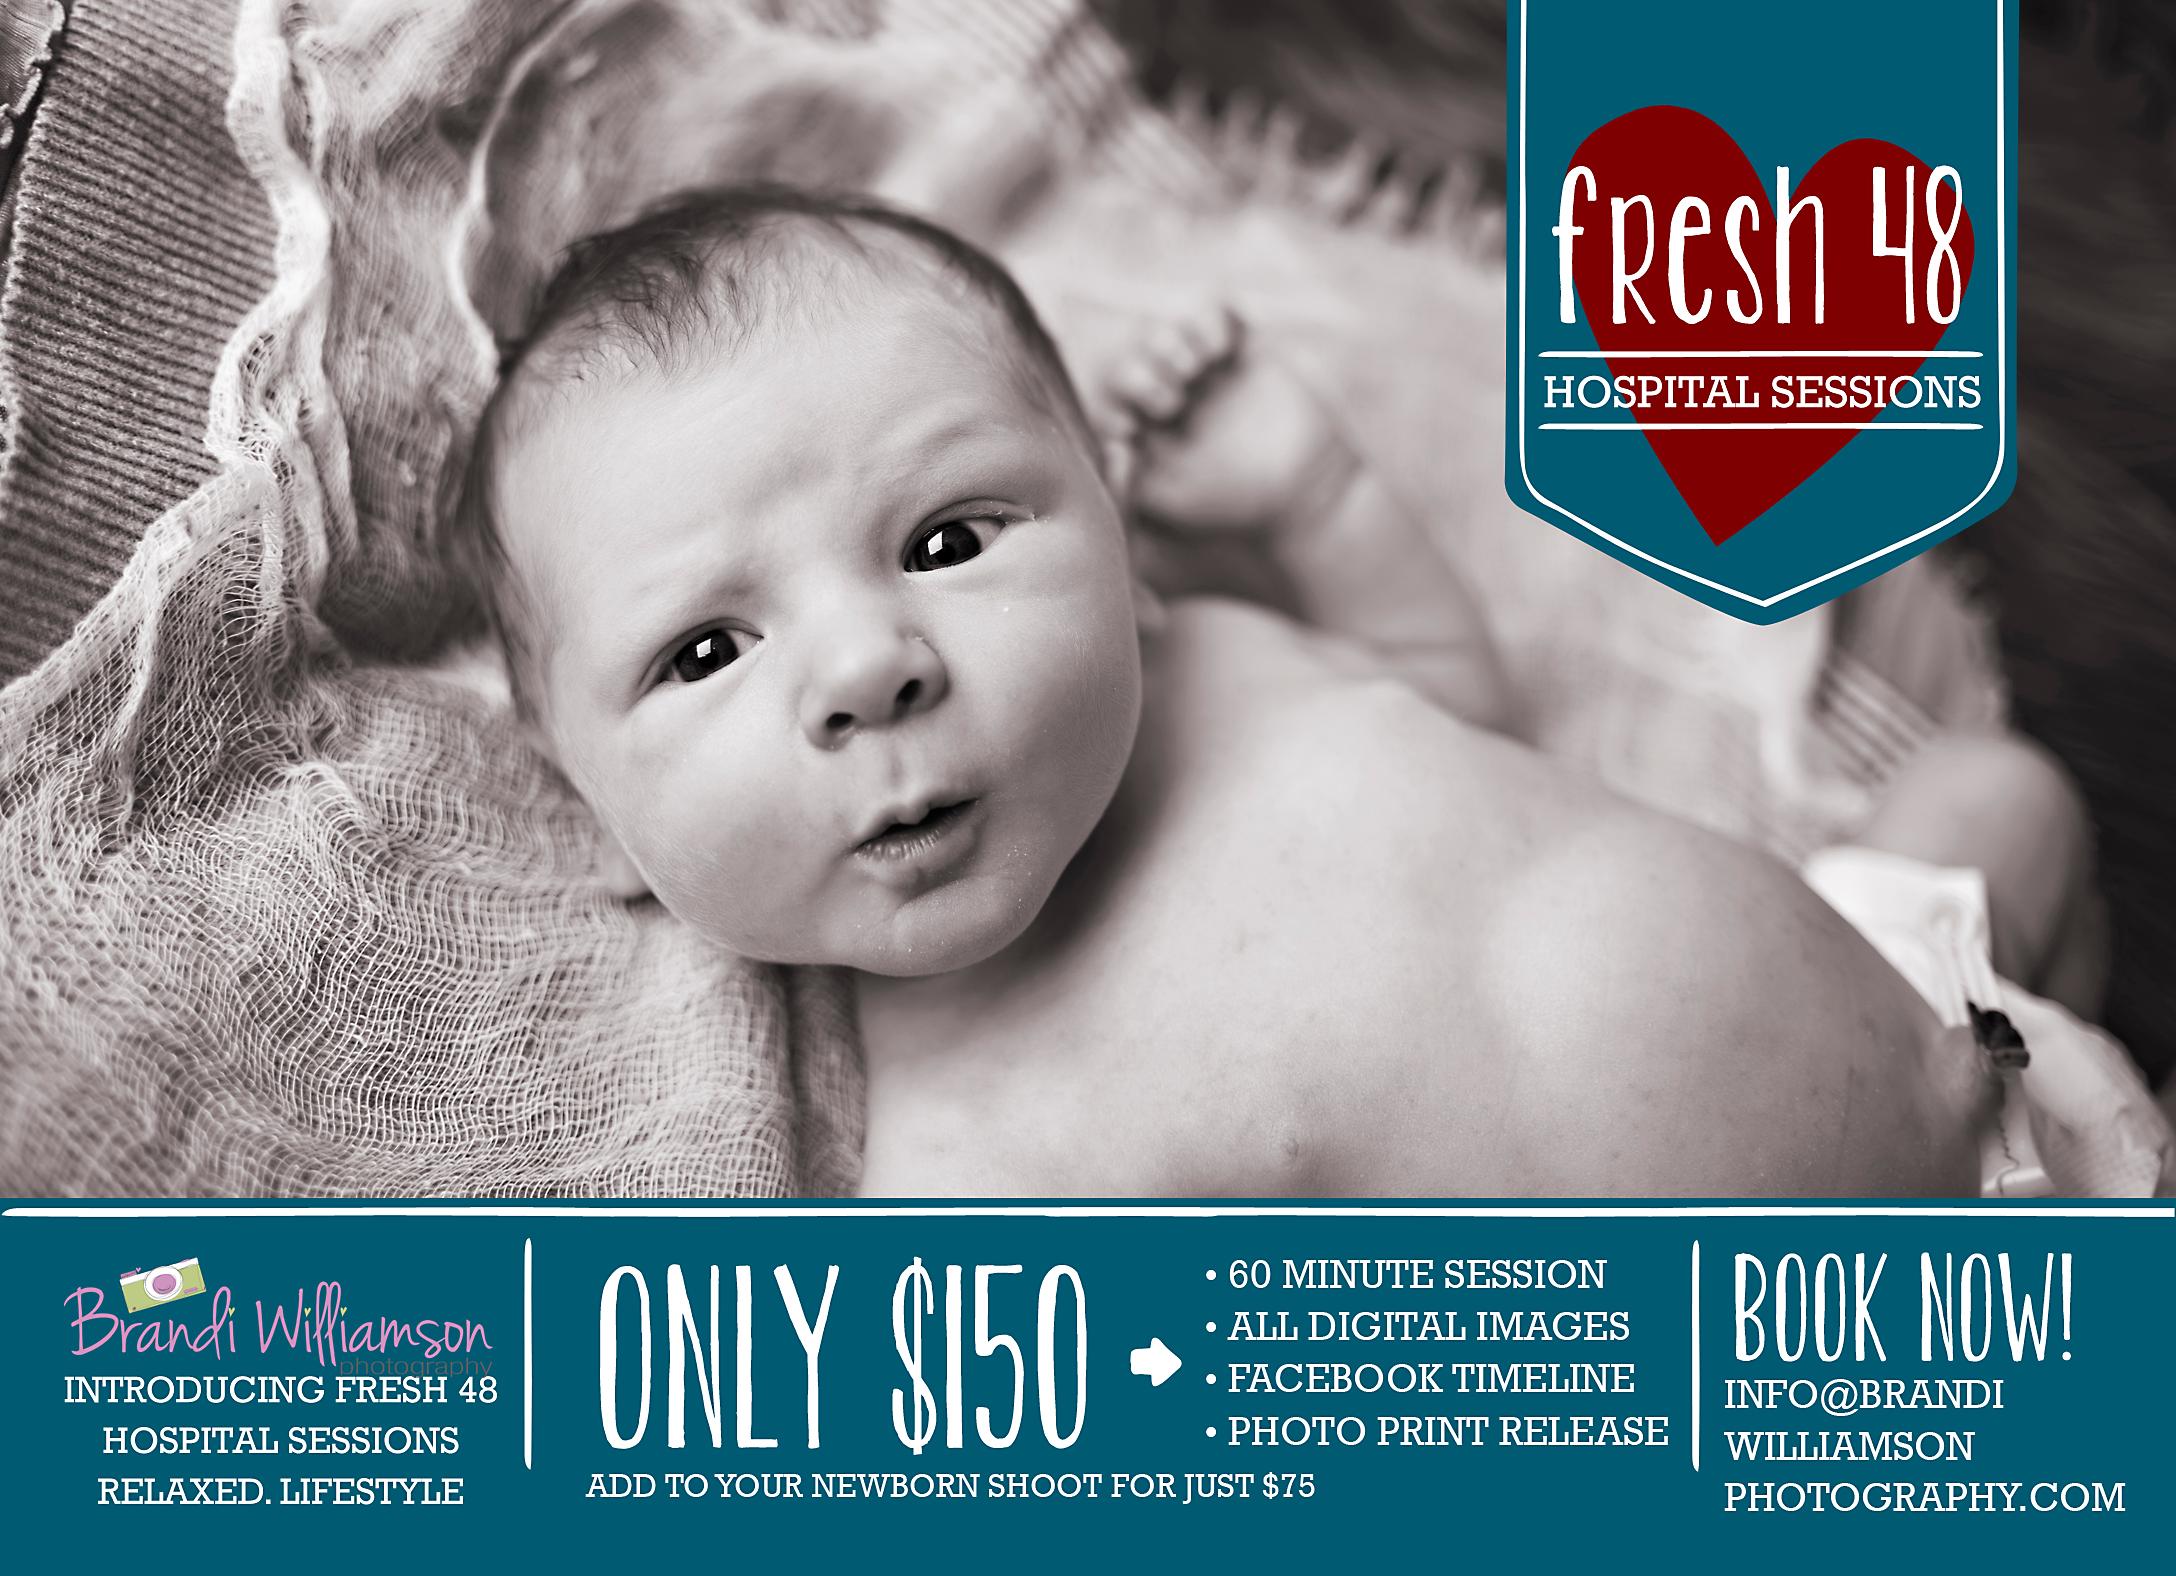 Dover, New Philadelphia OH hospital newborn session and photographer | Fresh 48 Hospital Session | Brandi Williamson Photography